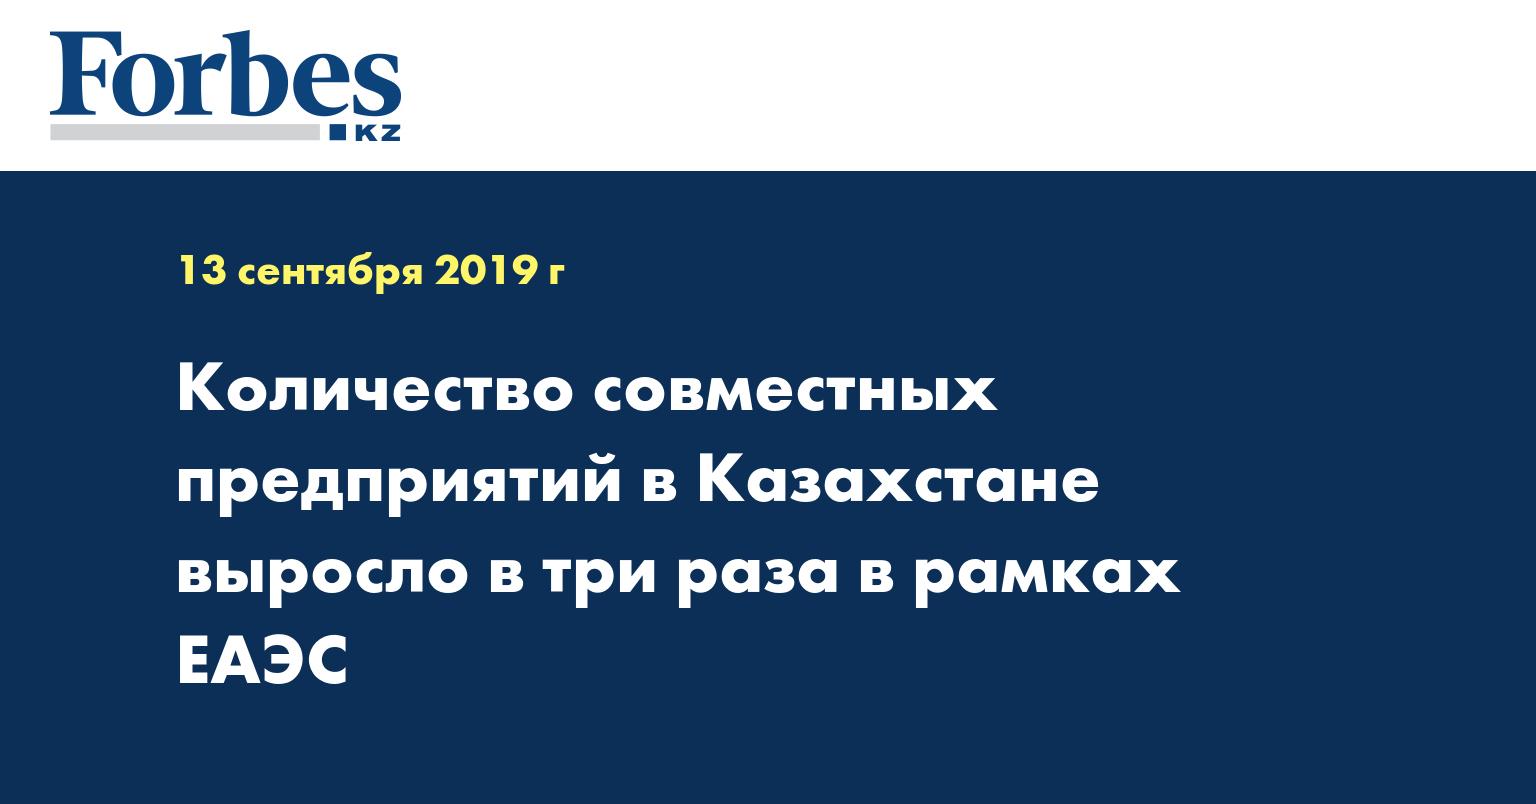 Количество совместных предприятий в Казахстане выросло в три раза в рамках ЕАЭС